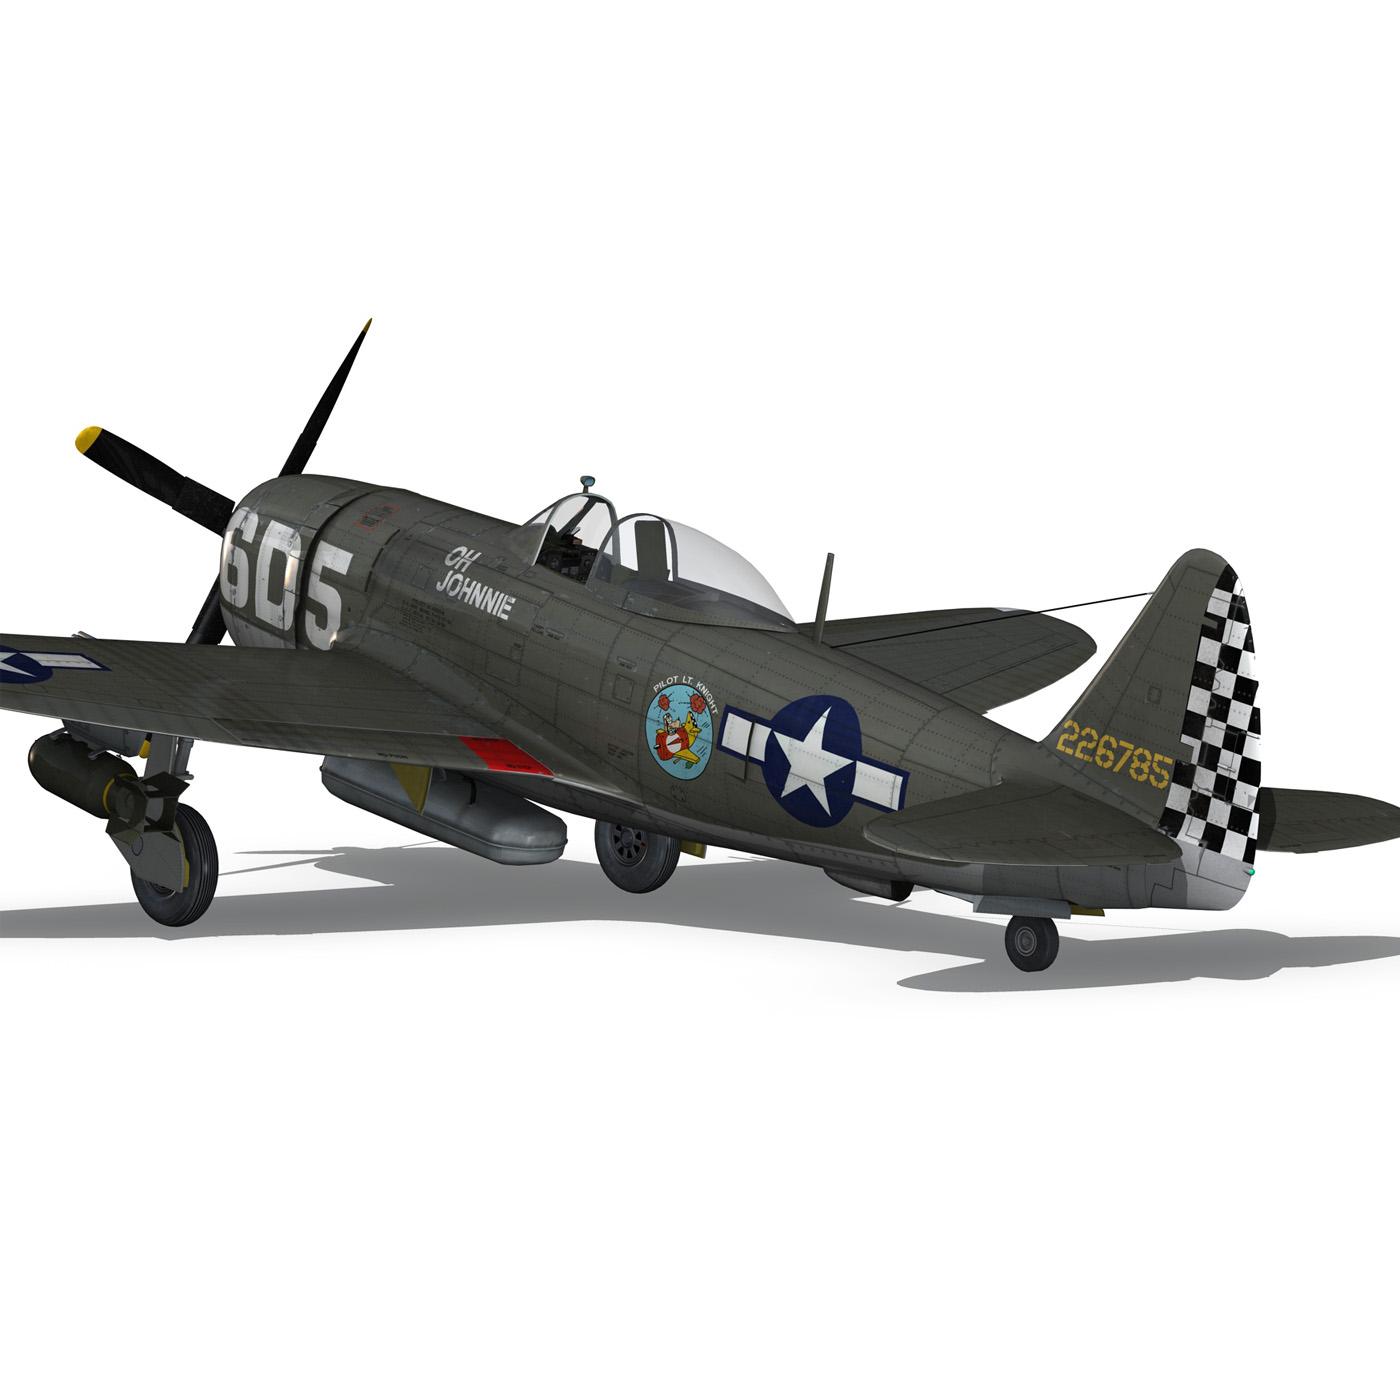 republic p-47 thunderbolt – oh johnnie 3d model fbx c4d lwo obj 274257